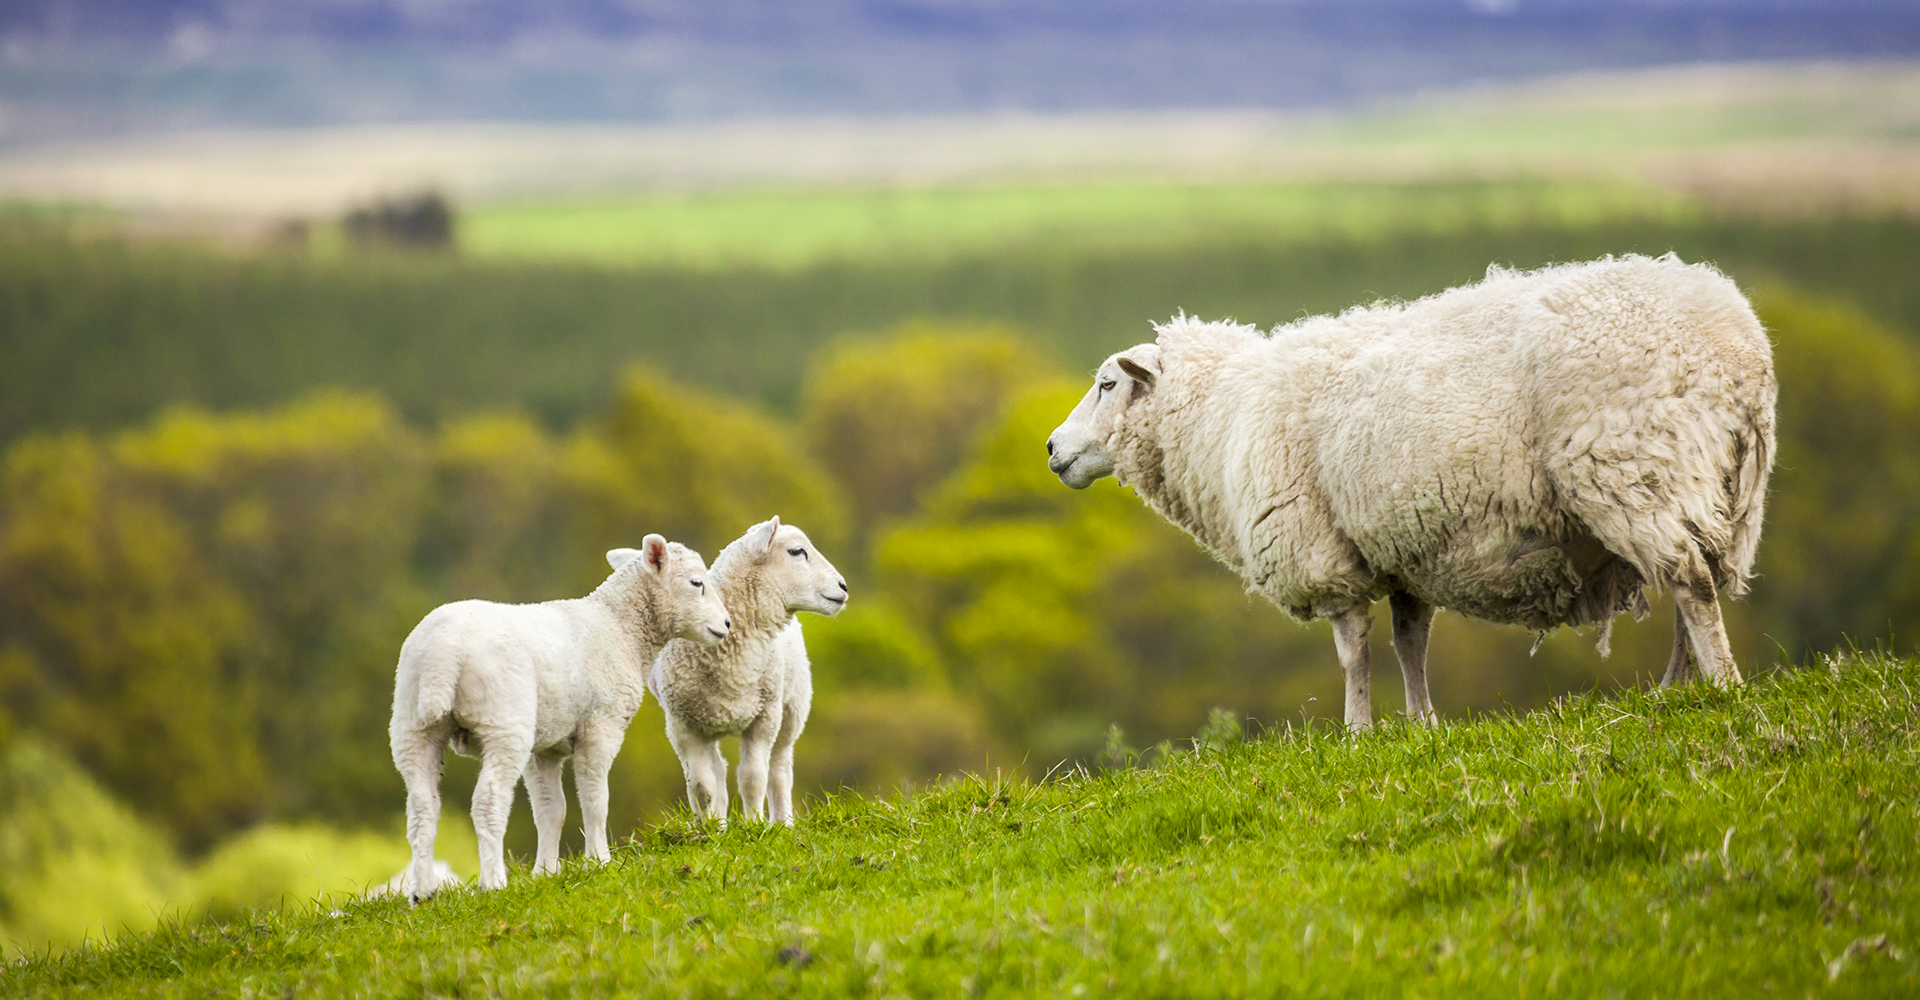 pura lana vergine - fibre naturali